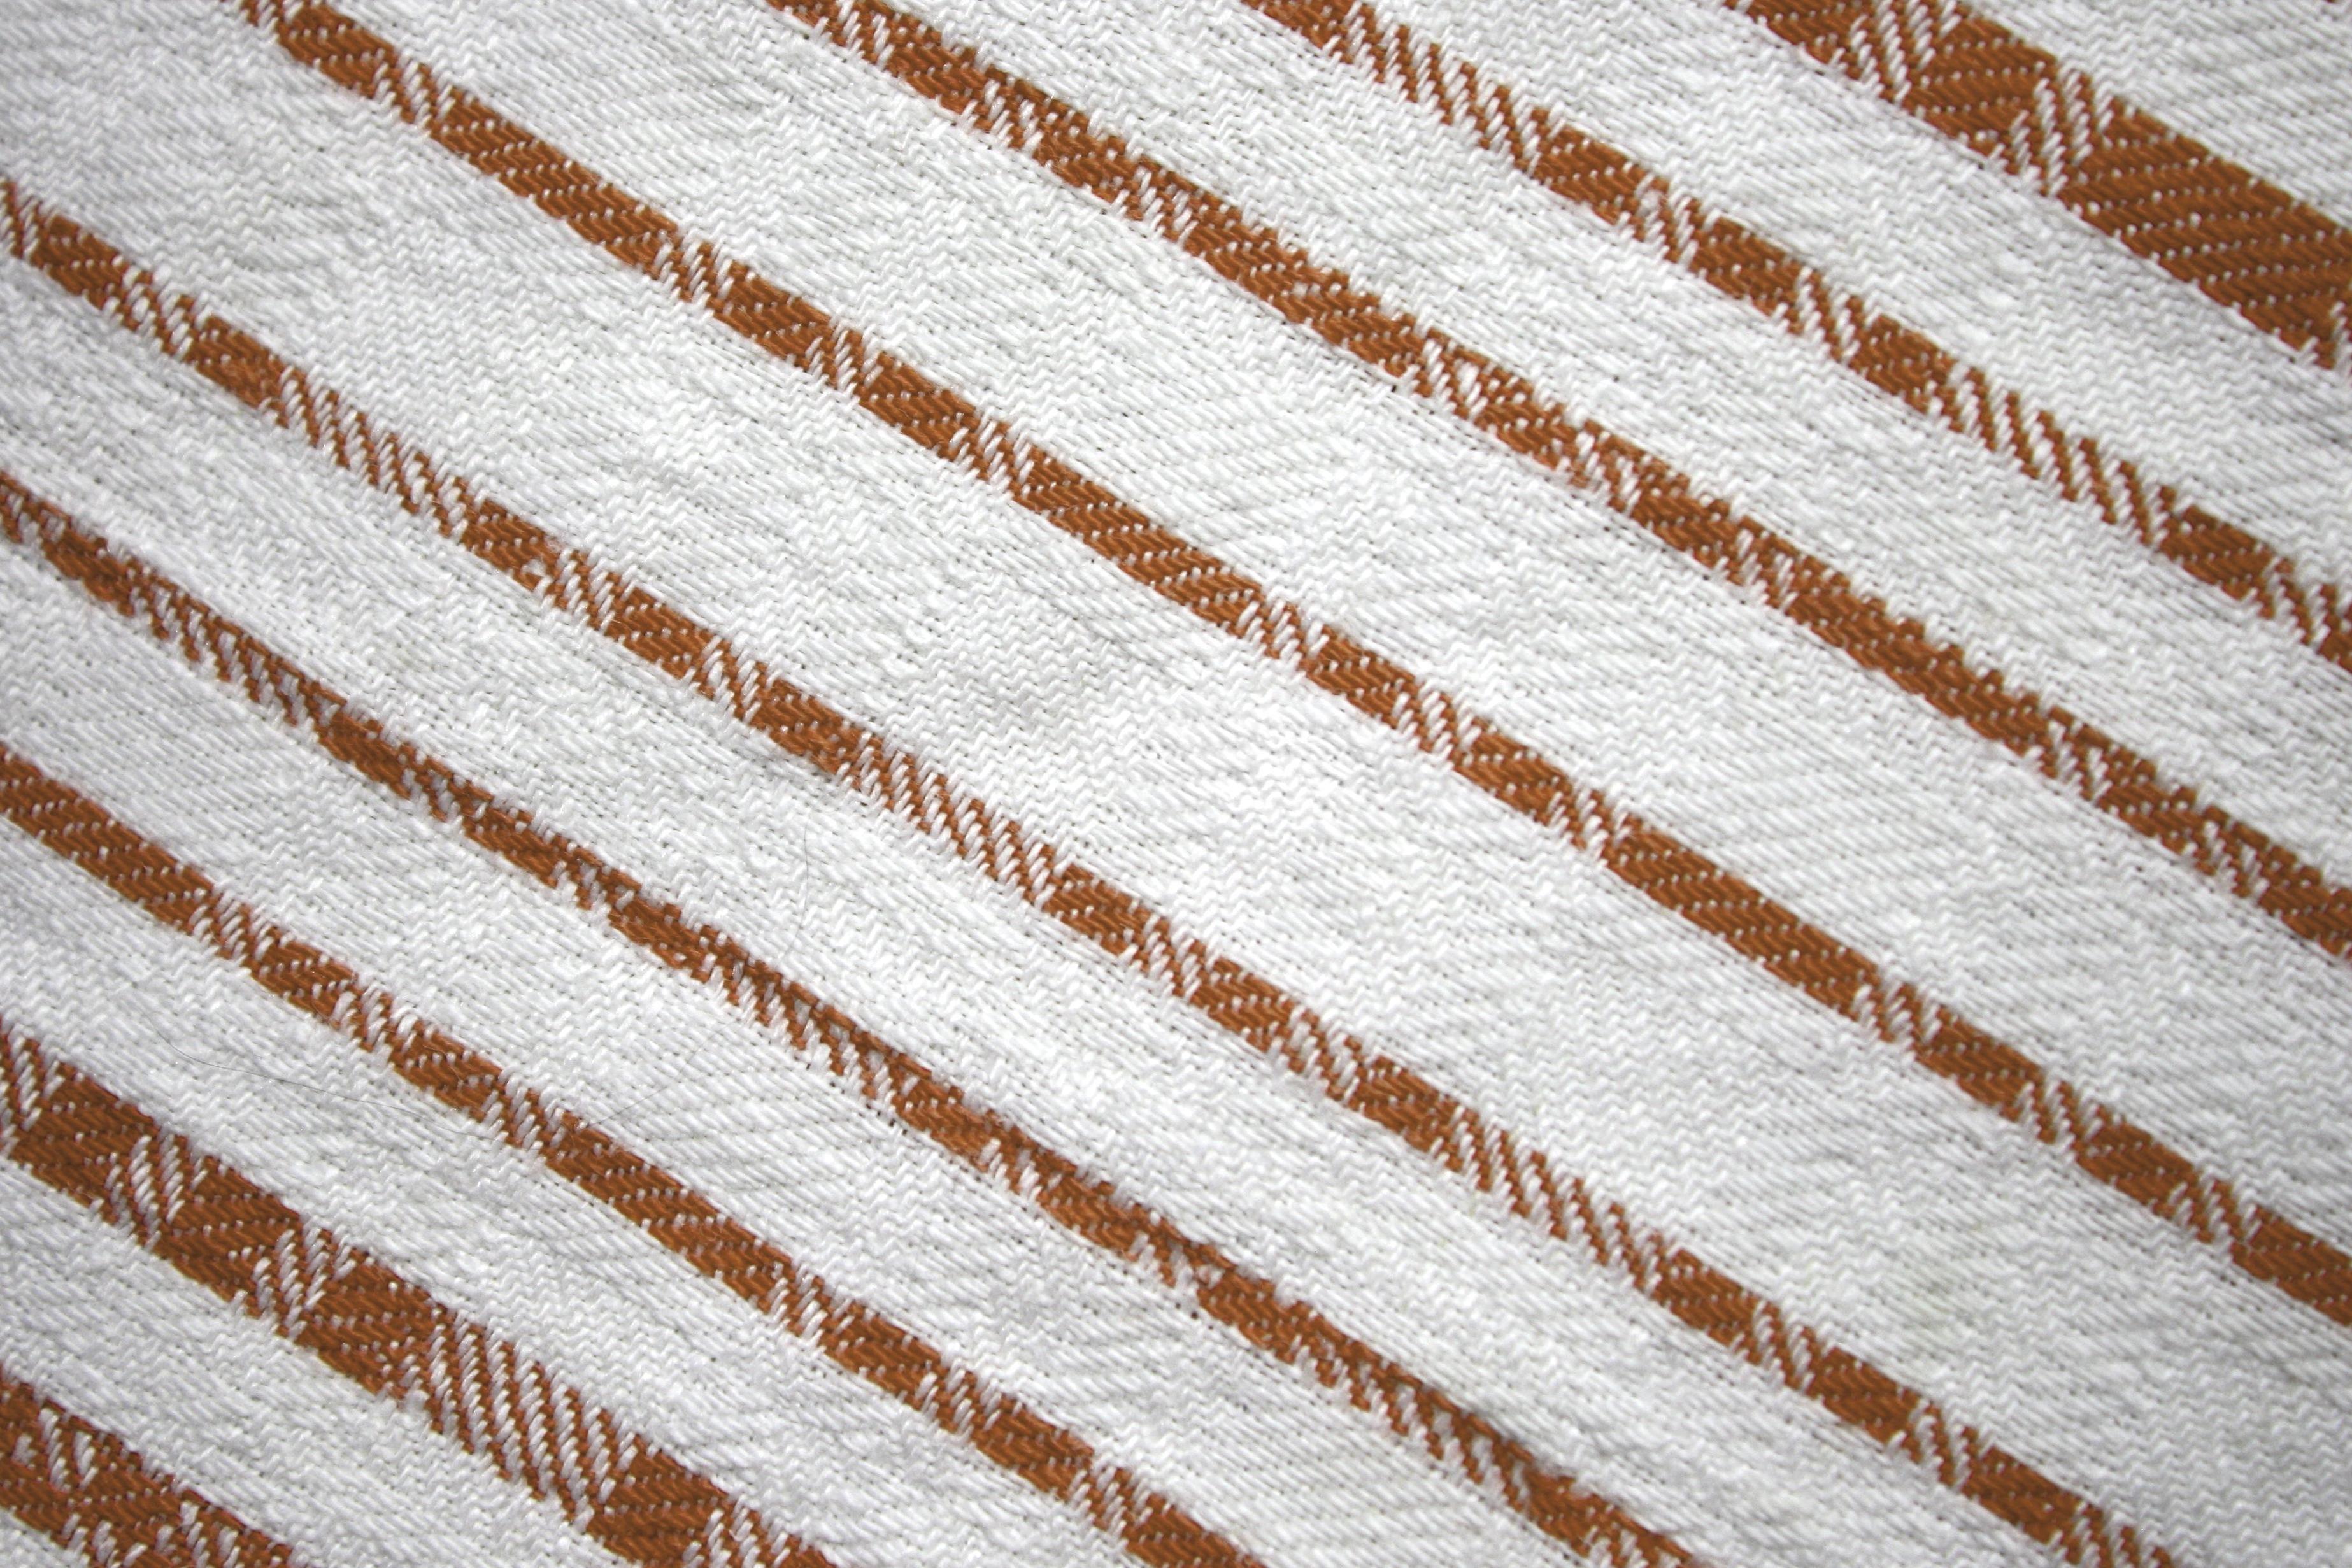 Free picture: dishcloth, brown, white, diagonal stripes, fabric ...